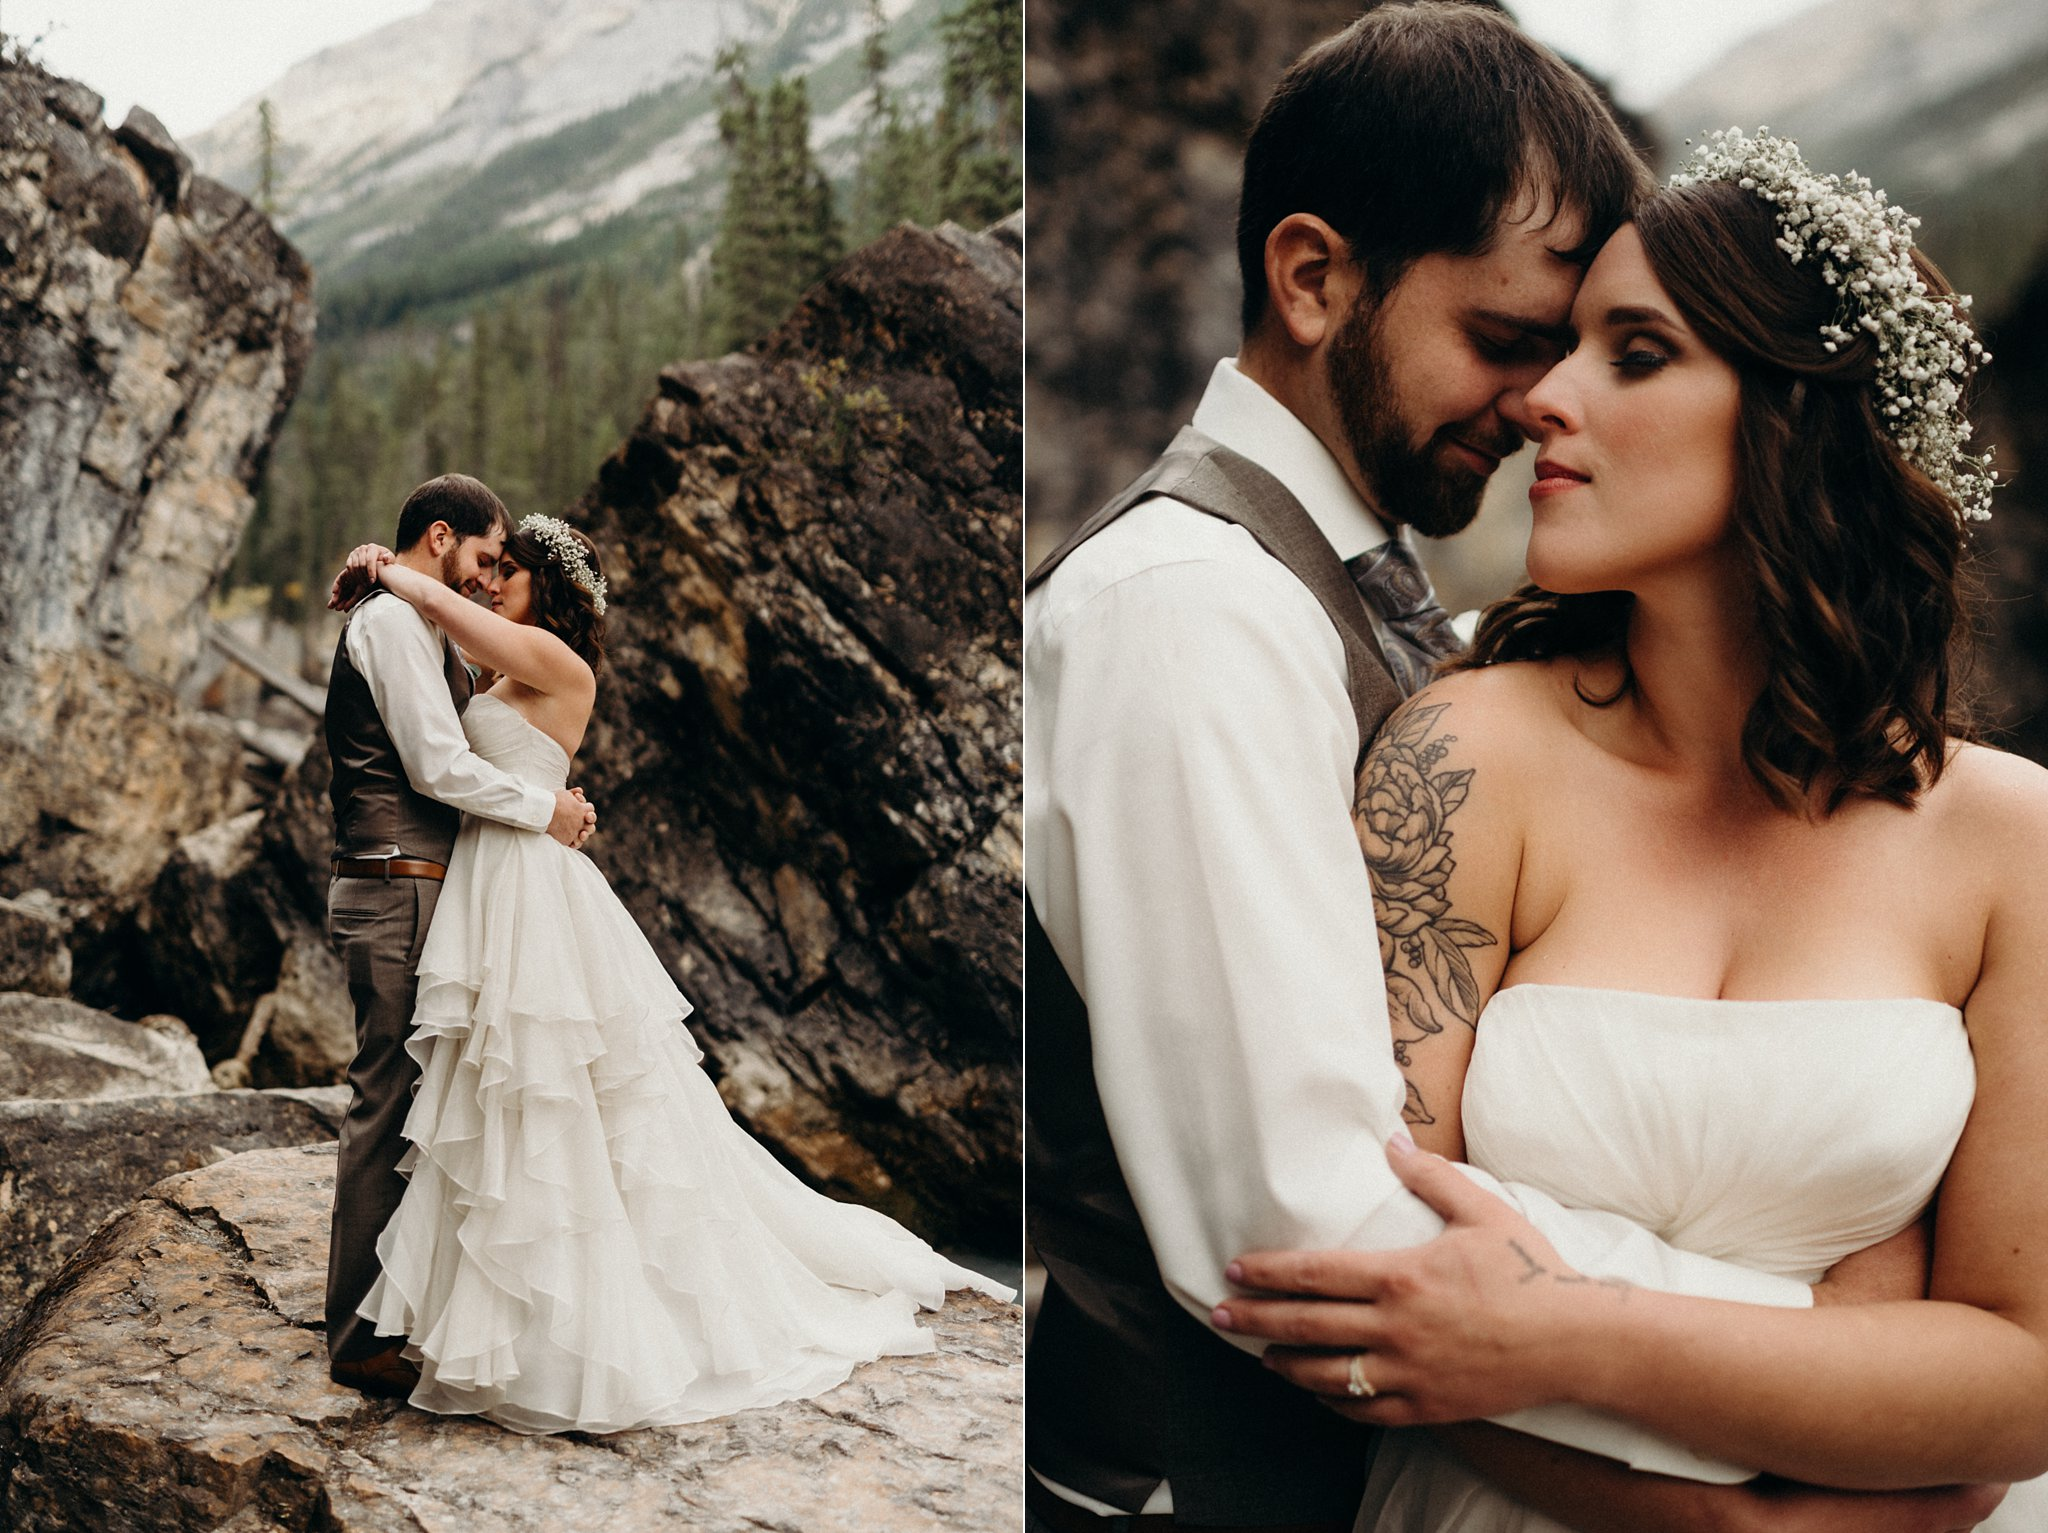 kaihla_tonai_intimate_wedding_elopement_photographer_6897.jpg